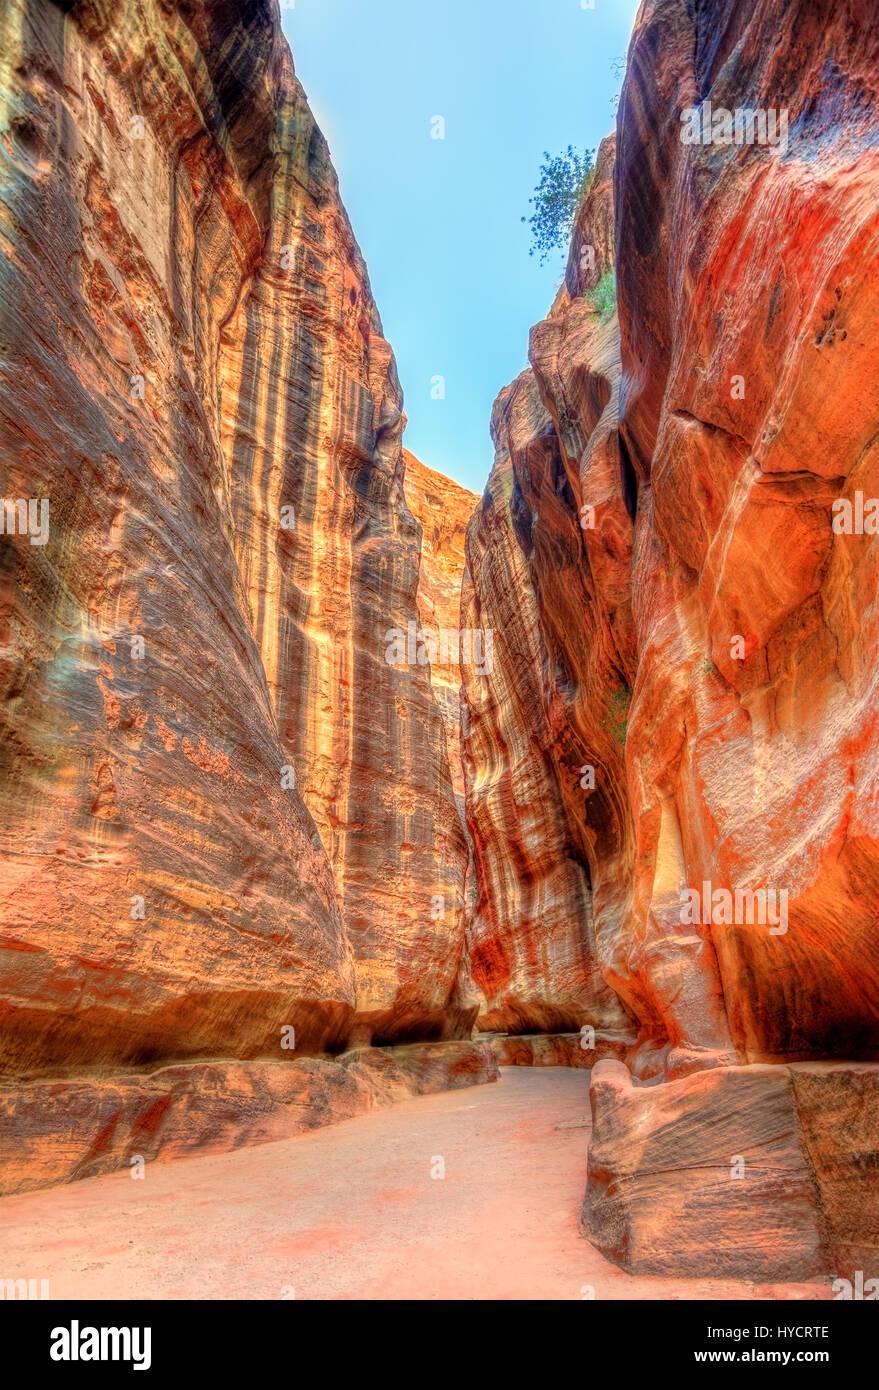 Road inside the Siq Canyon at Petra - Stock Image